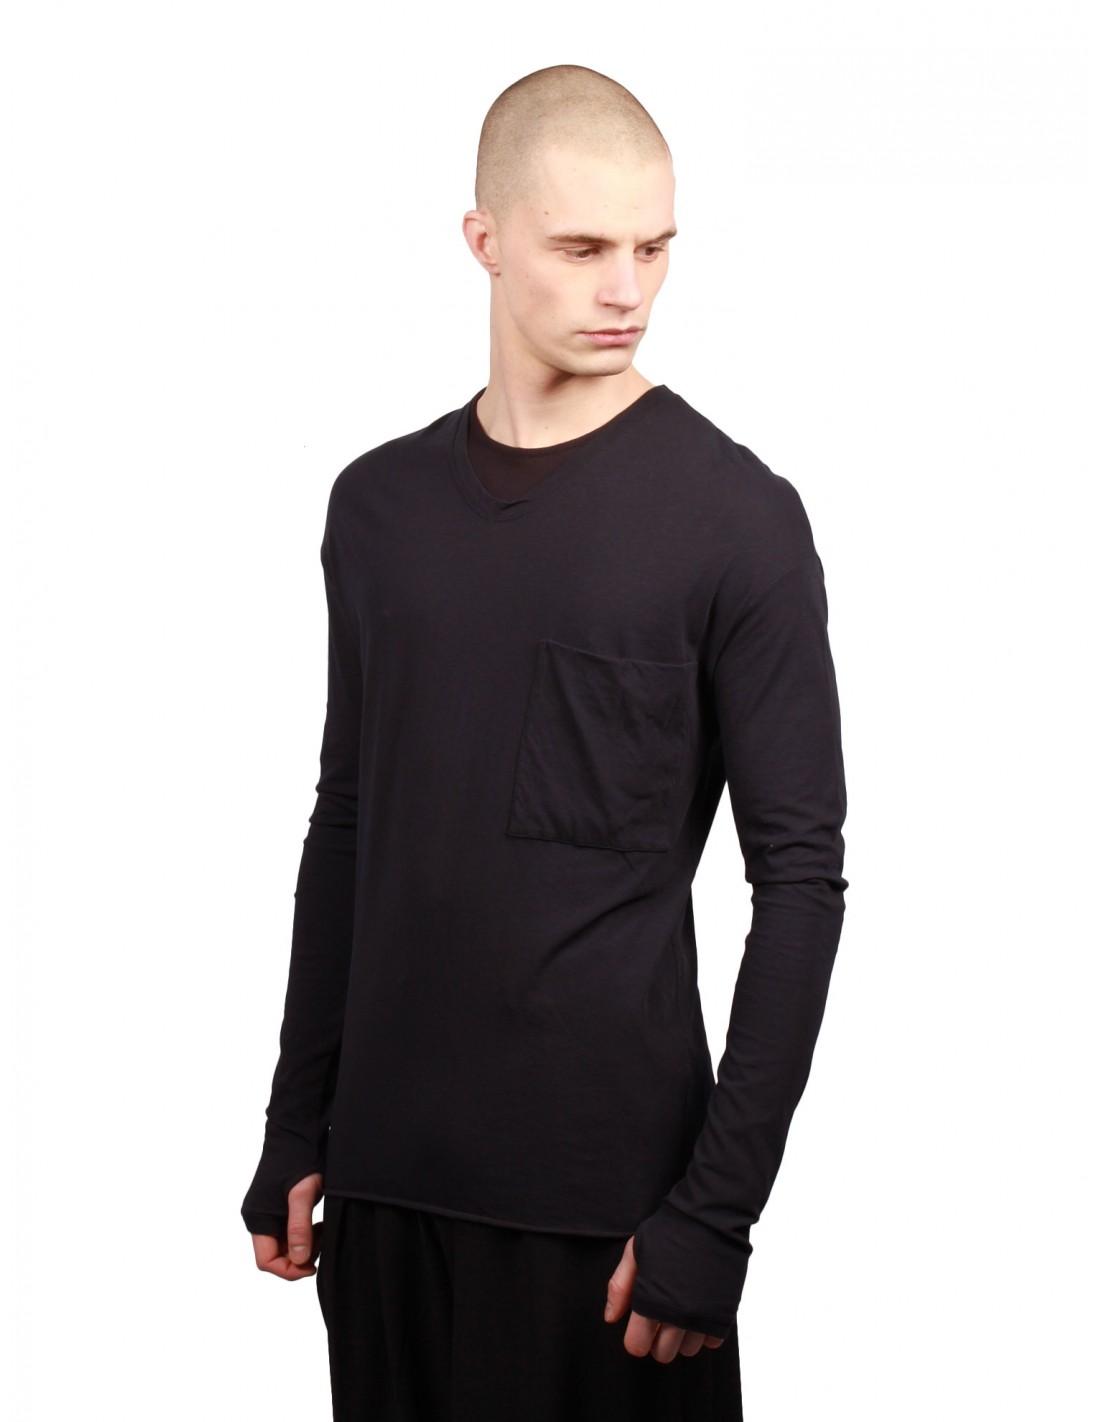 1c6c720e57c58 Long Sleeves Tee Shirt - Navy Isabel Benenato for Man - serie     NOIRE